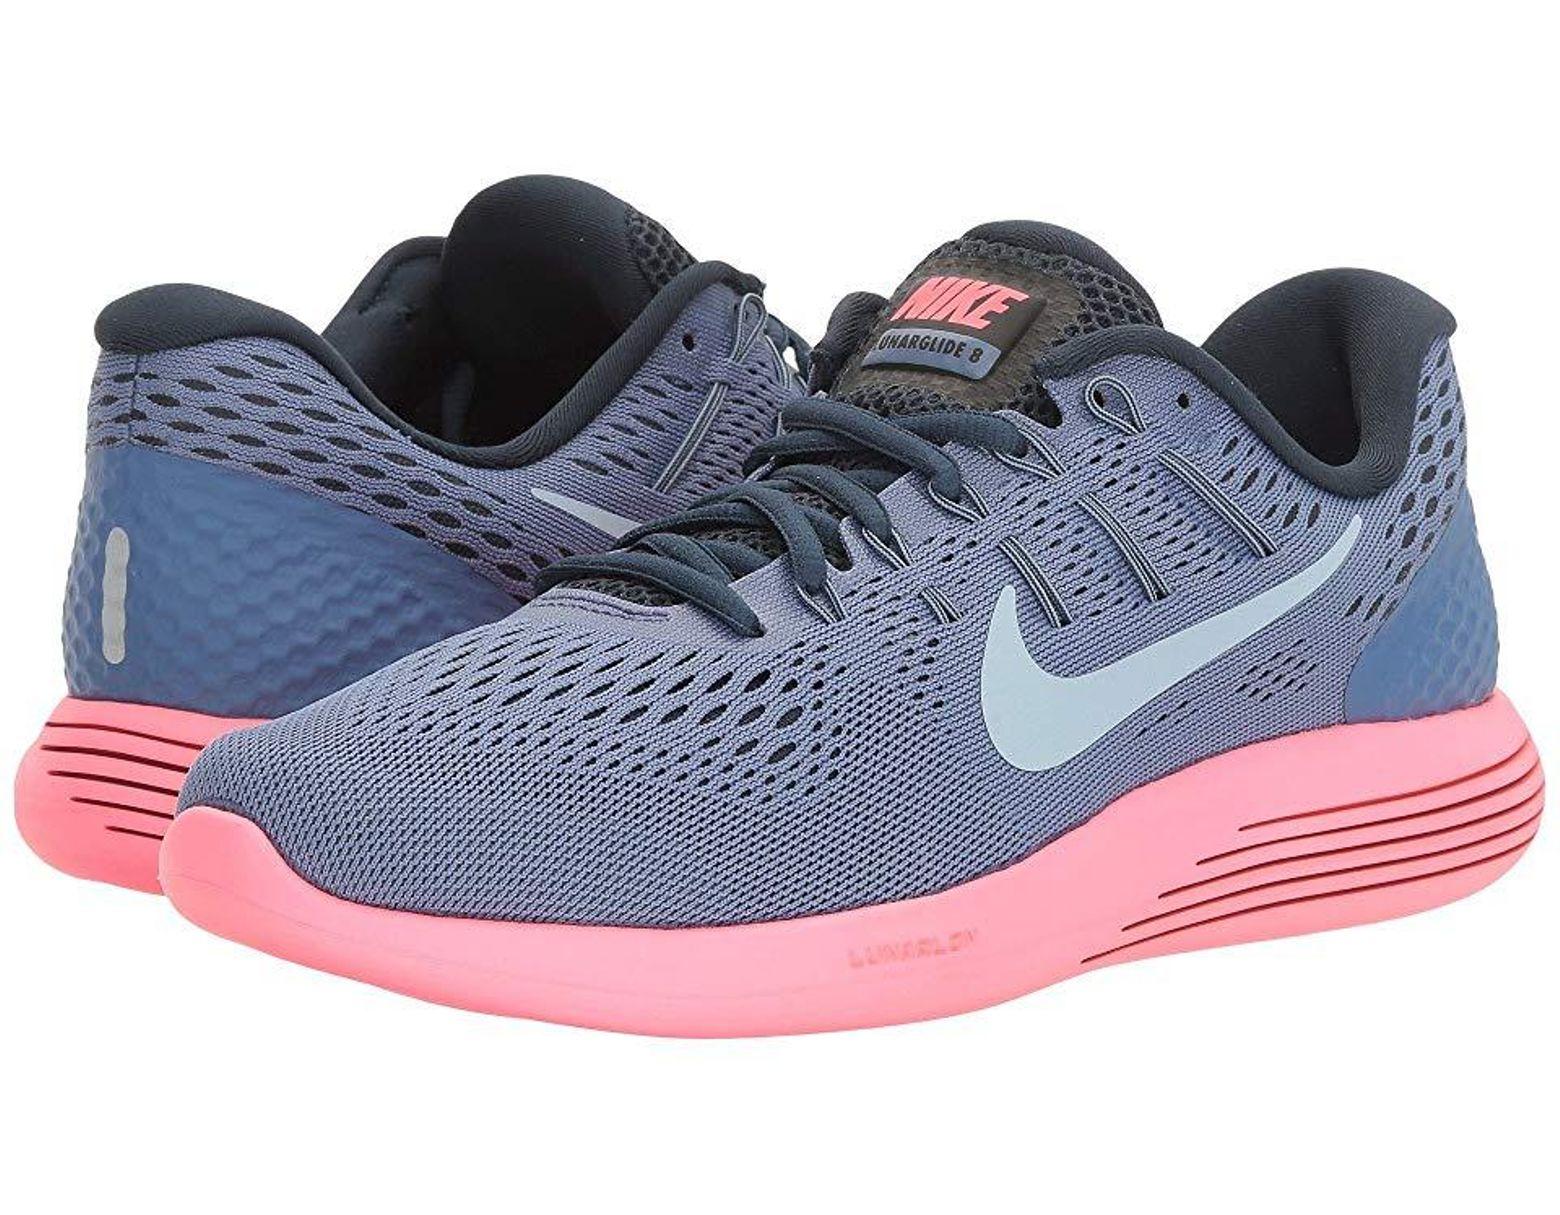 timeless design c26ea dc256 Nike Lunarglide 8 (blue Moon ligh Tarmory Blue racer Pink) Running Shoes in  Blue - Lyst